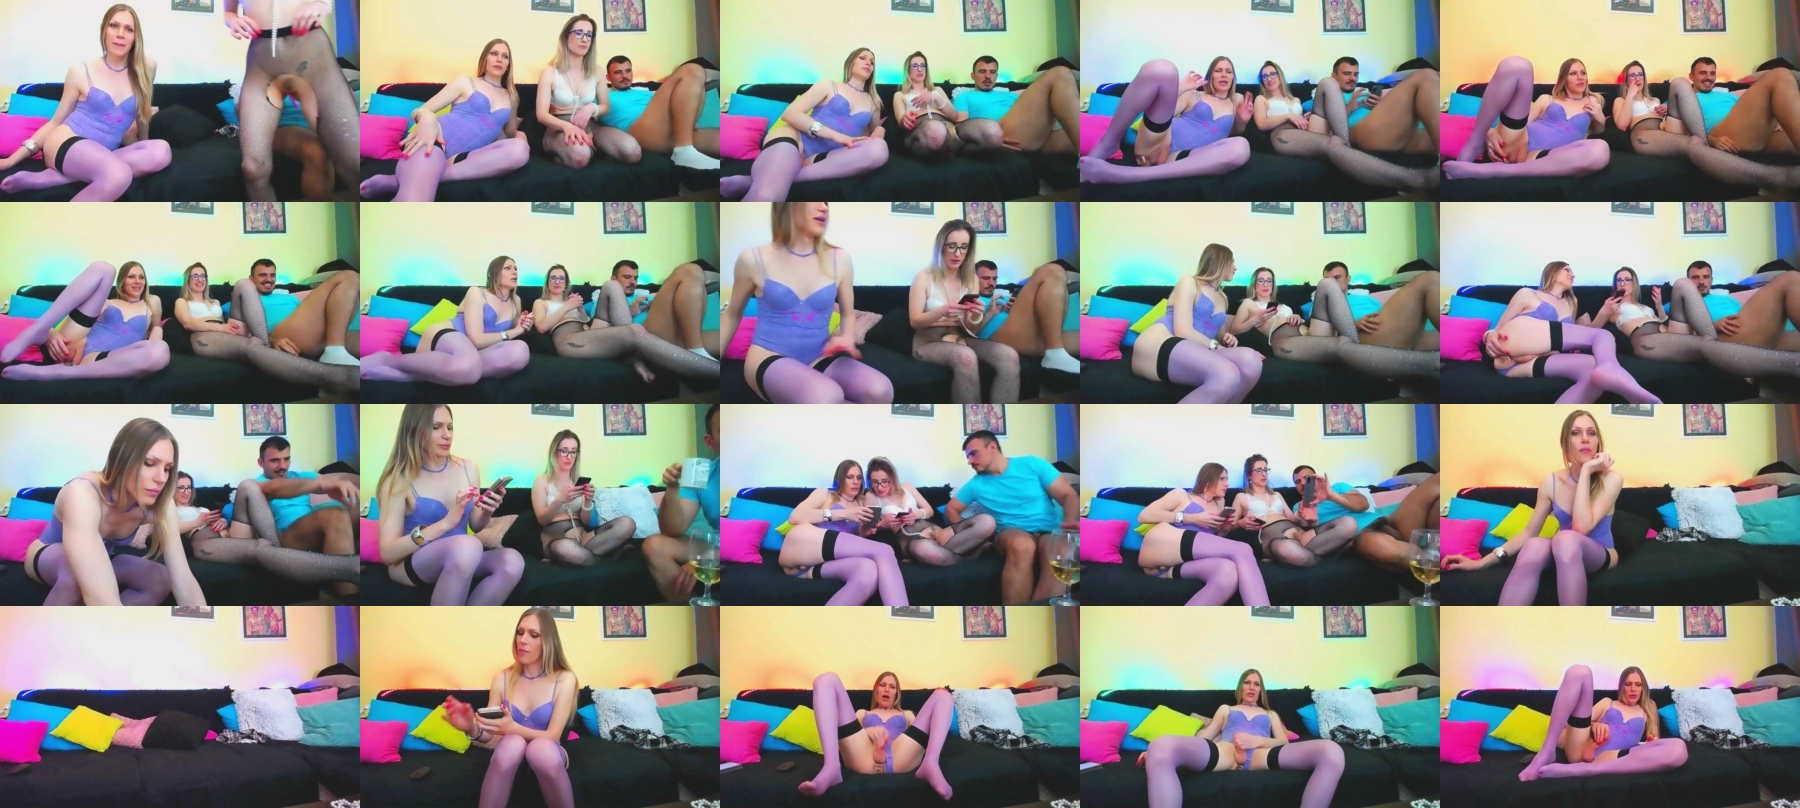 Sexy_Vania ts 10-06-2021 Chaturbate